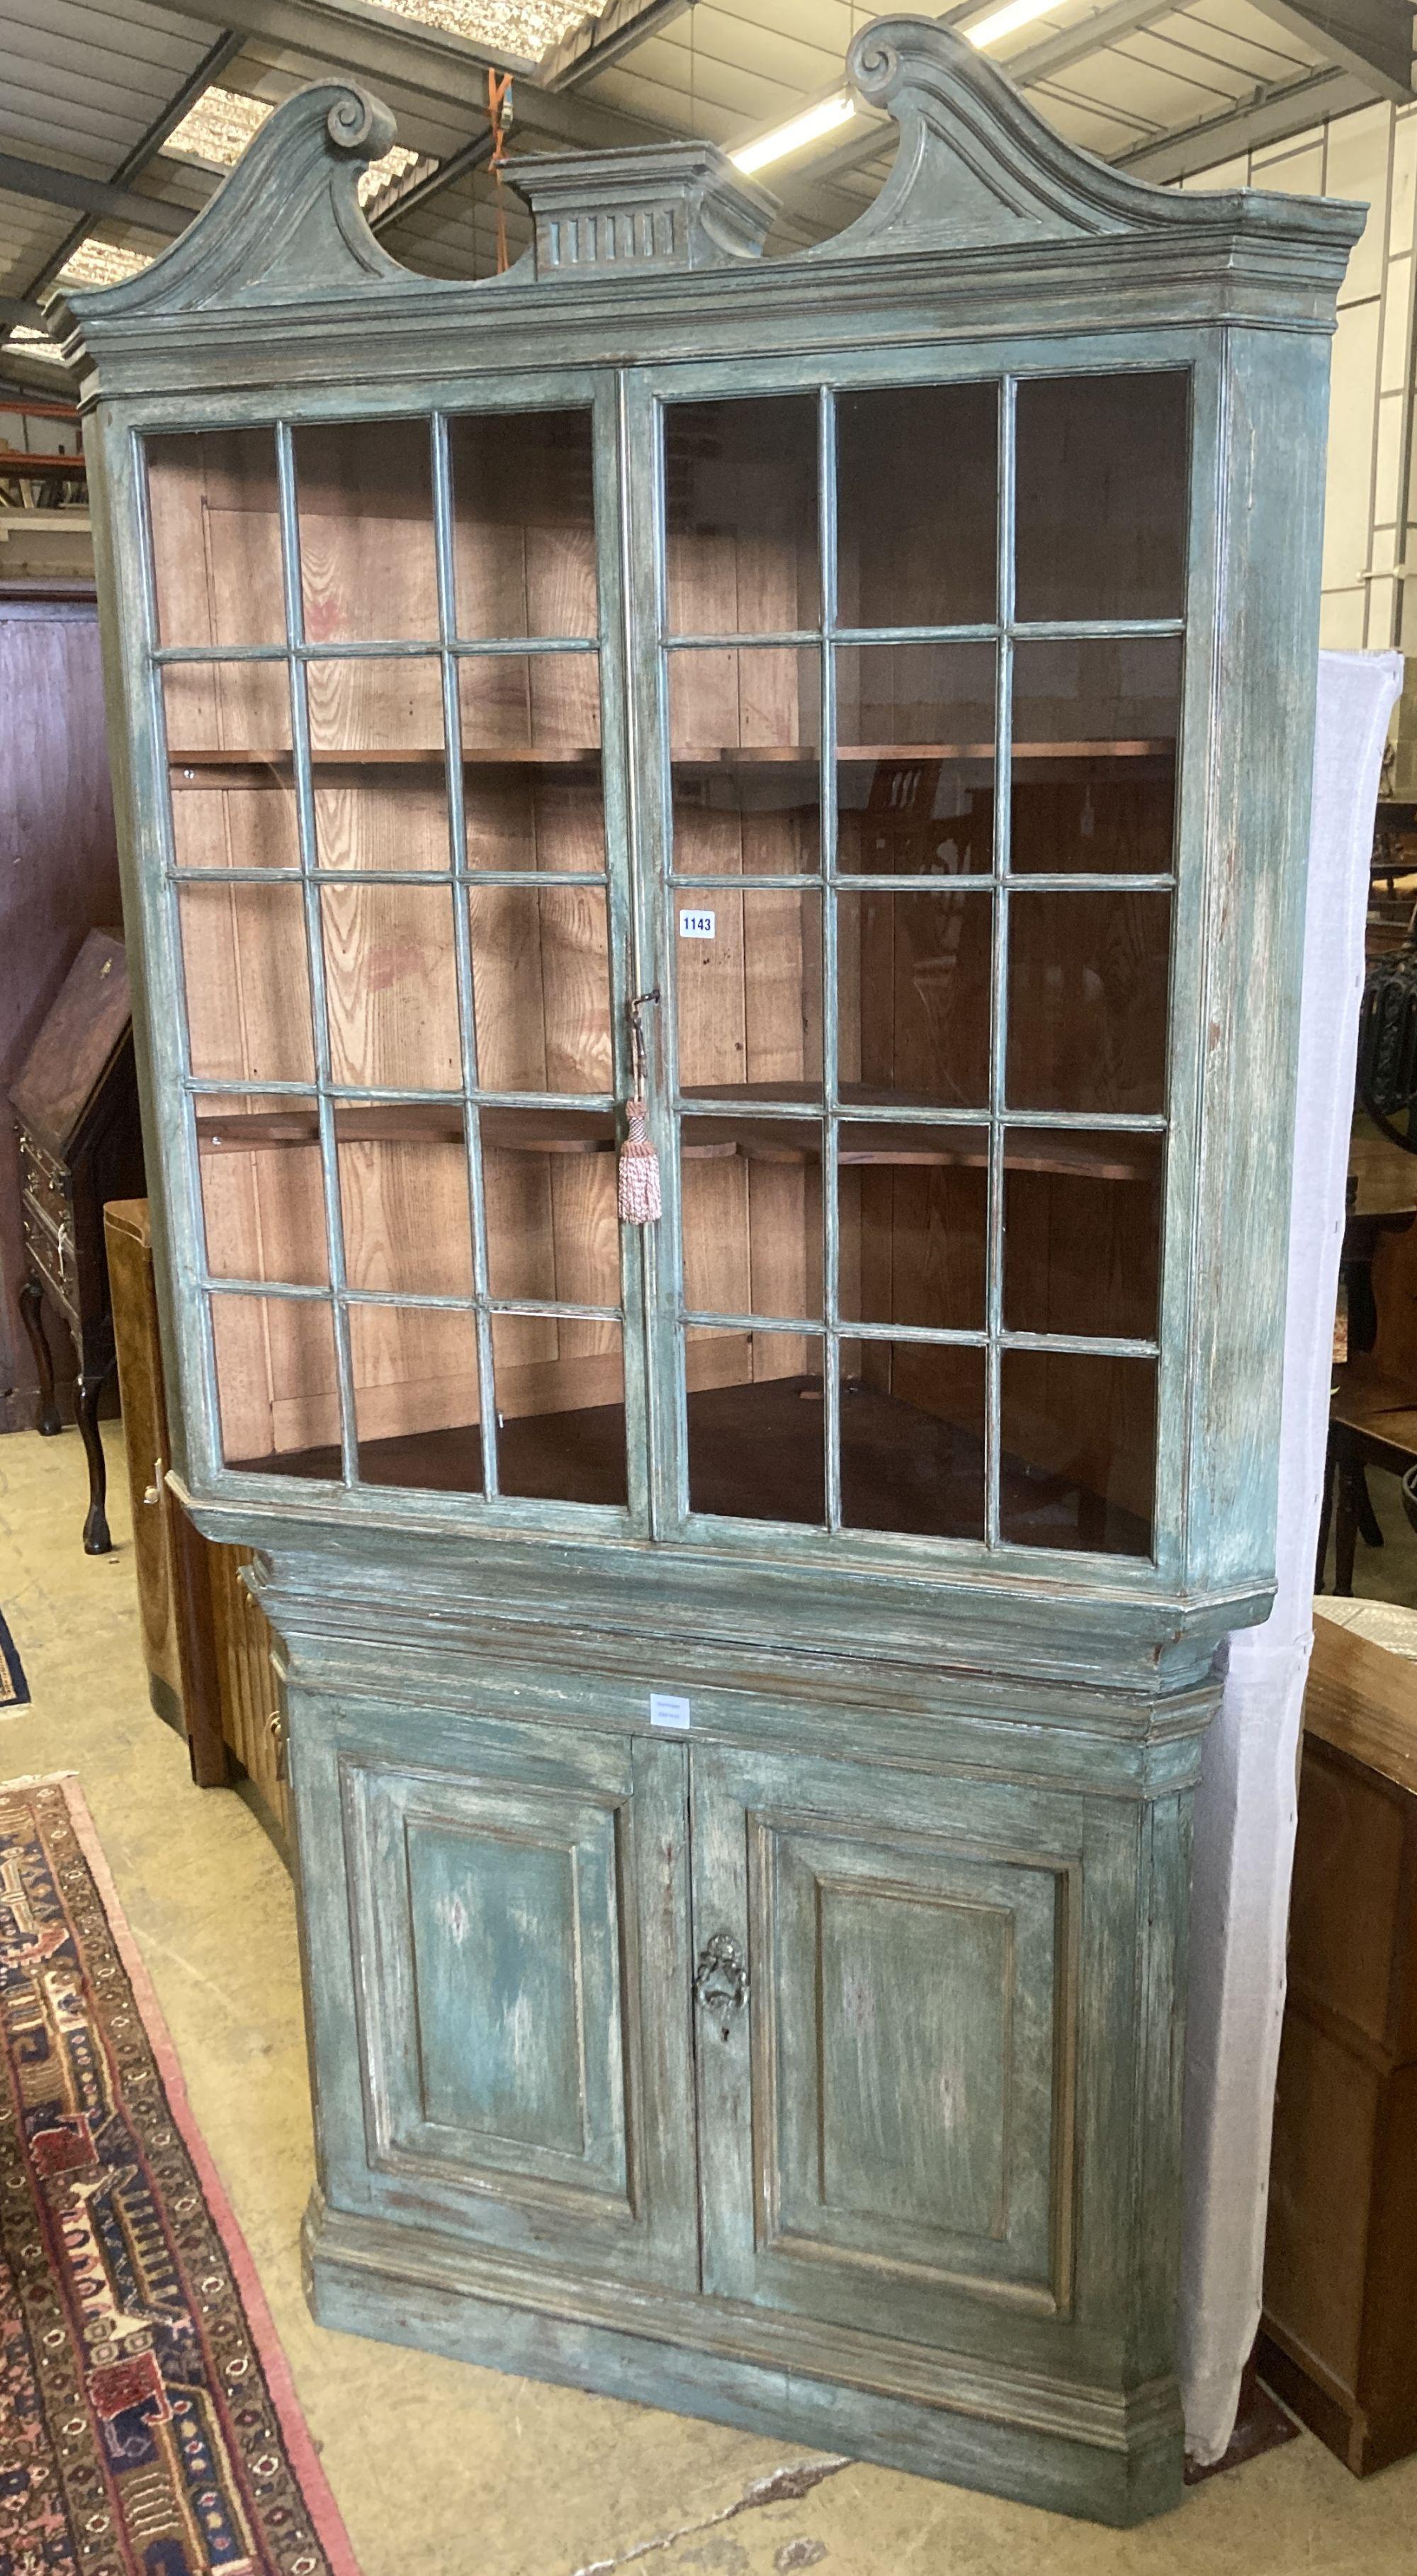 An 18th century style Dutch painted standing corner cabinet, width 112cm depth 60cm height 225cm